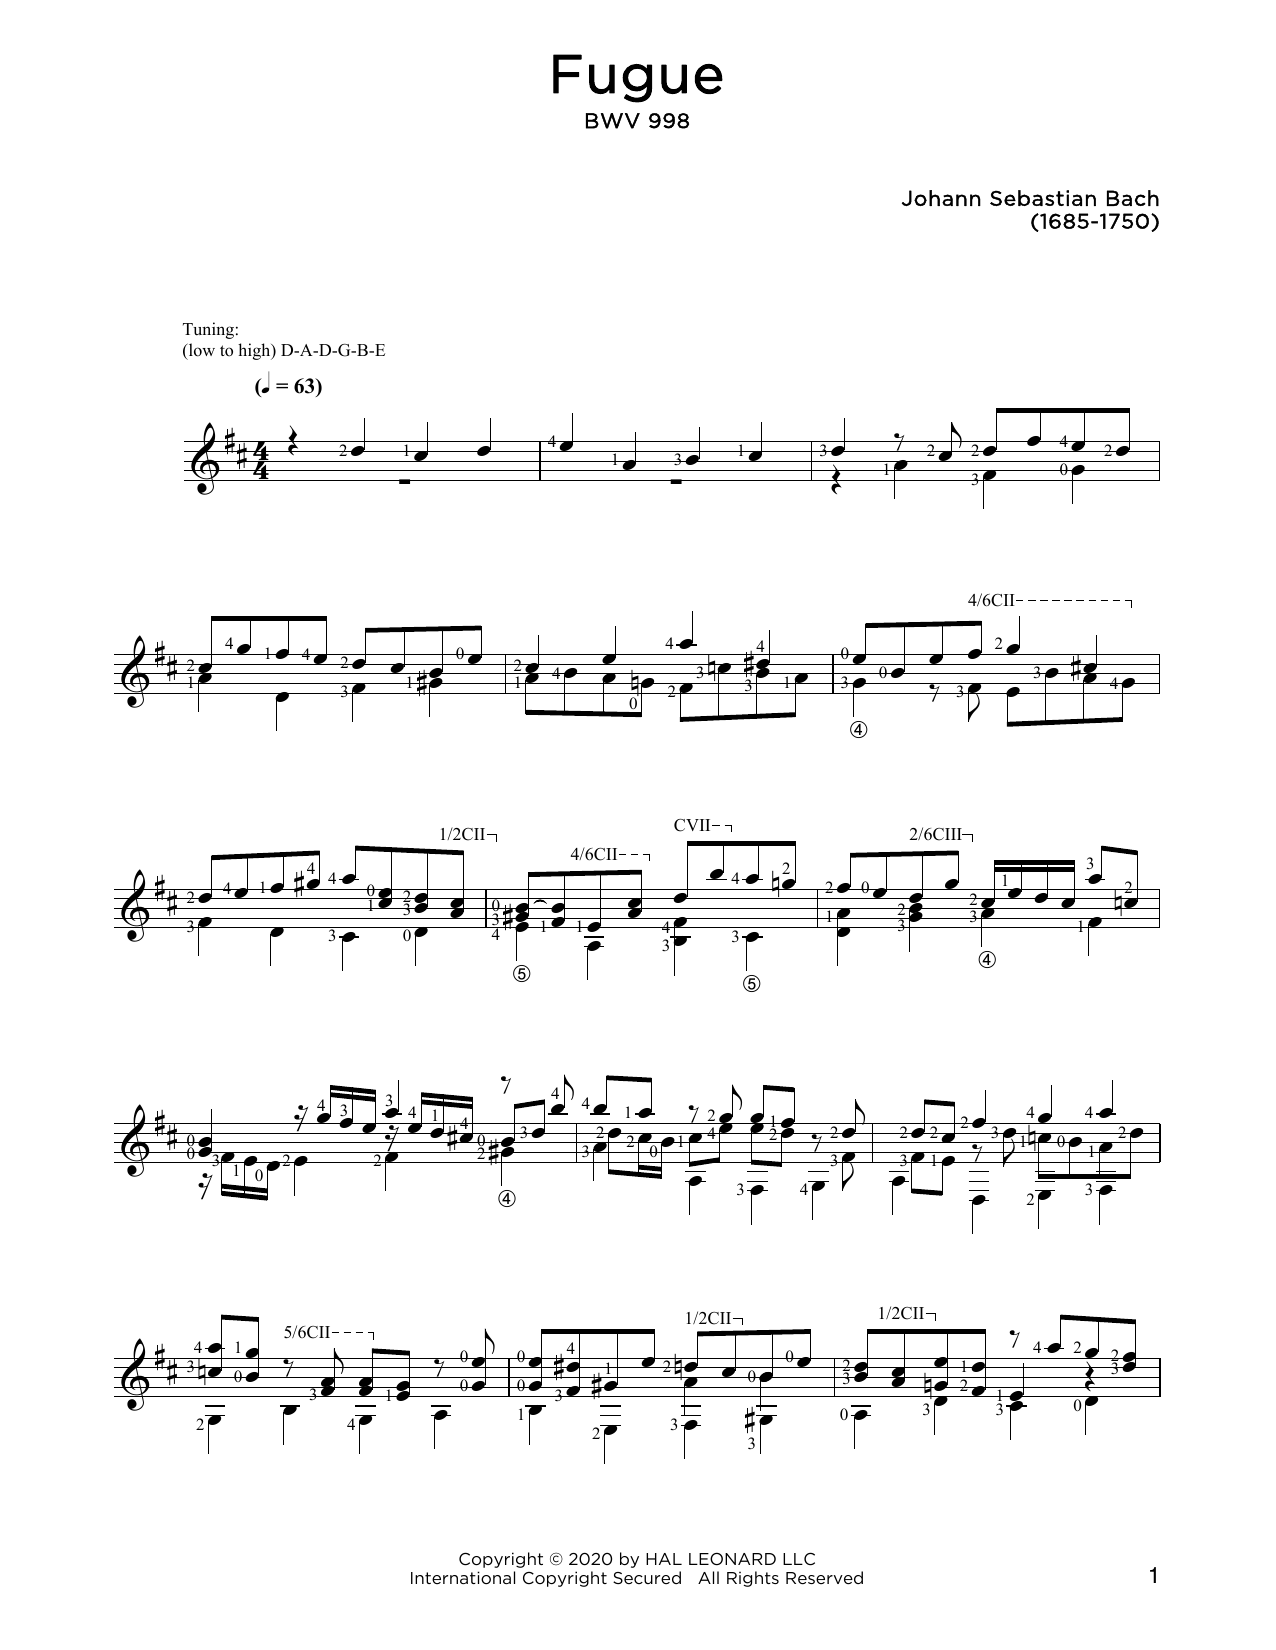 Johann Sebastian Bach Fugue In E-Flat Major, BWV 998 sheet music notes and chords. Download Printable PDF.